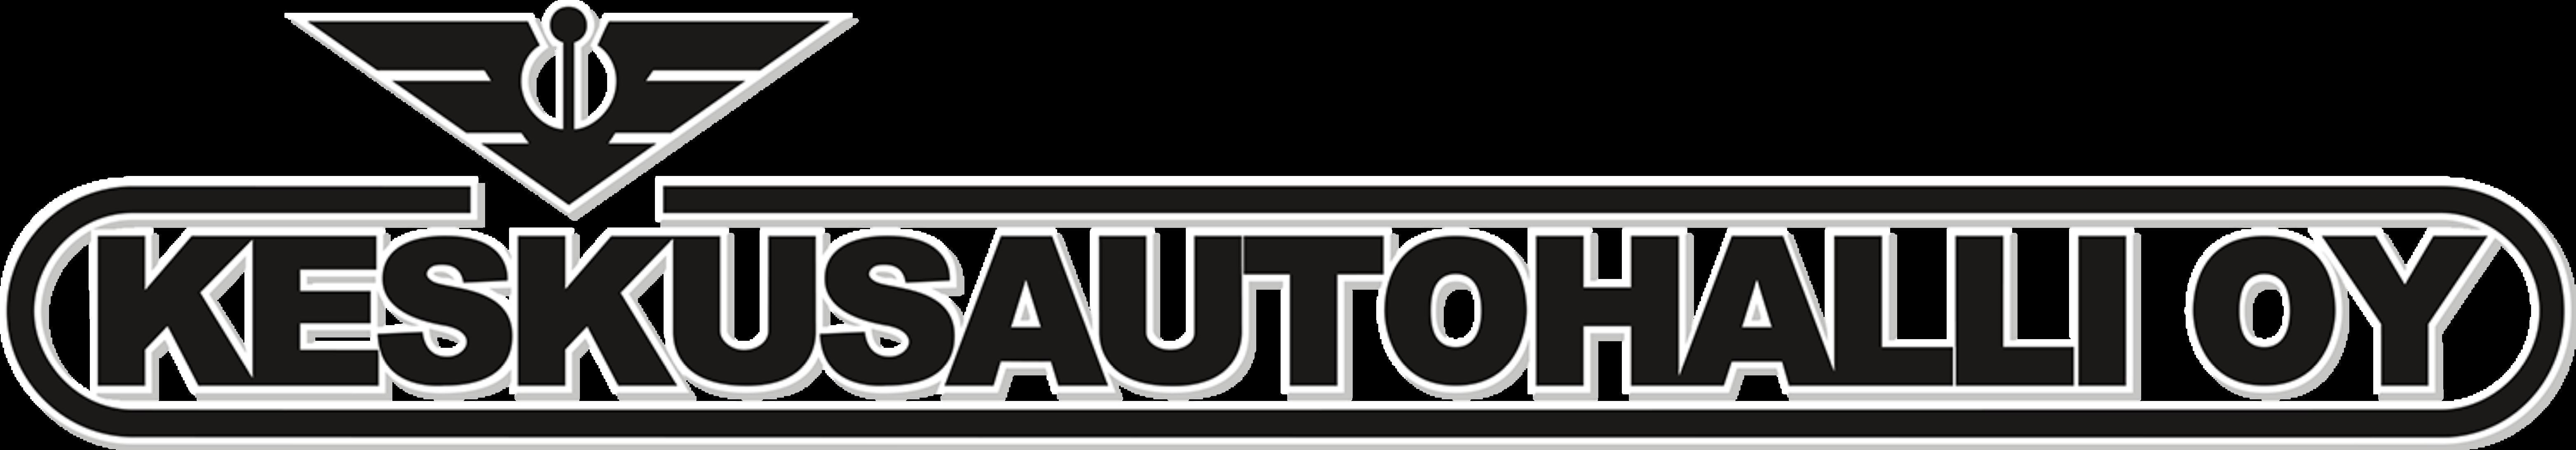 Keskusautohalli logo